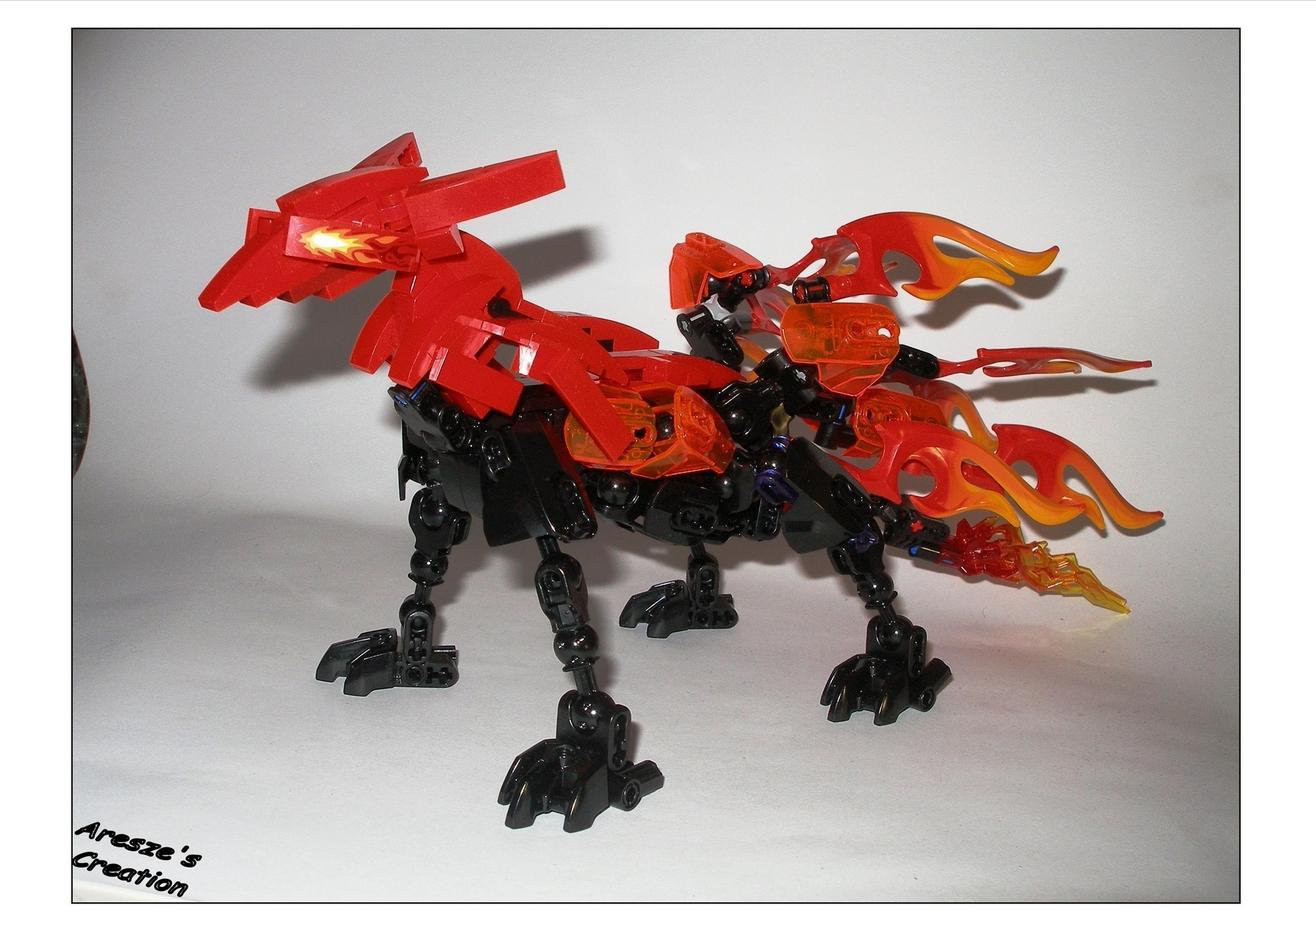 aresze moc - Nine-tailed Fox 002